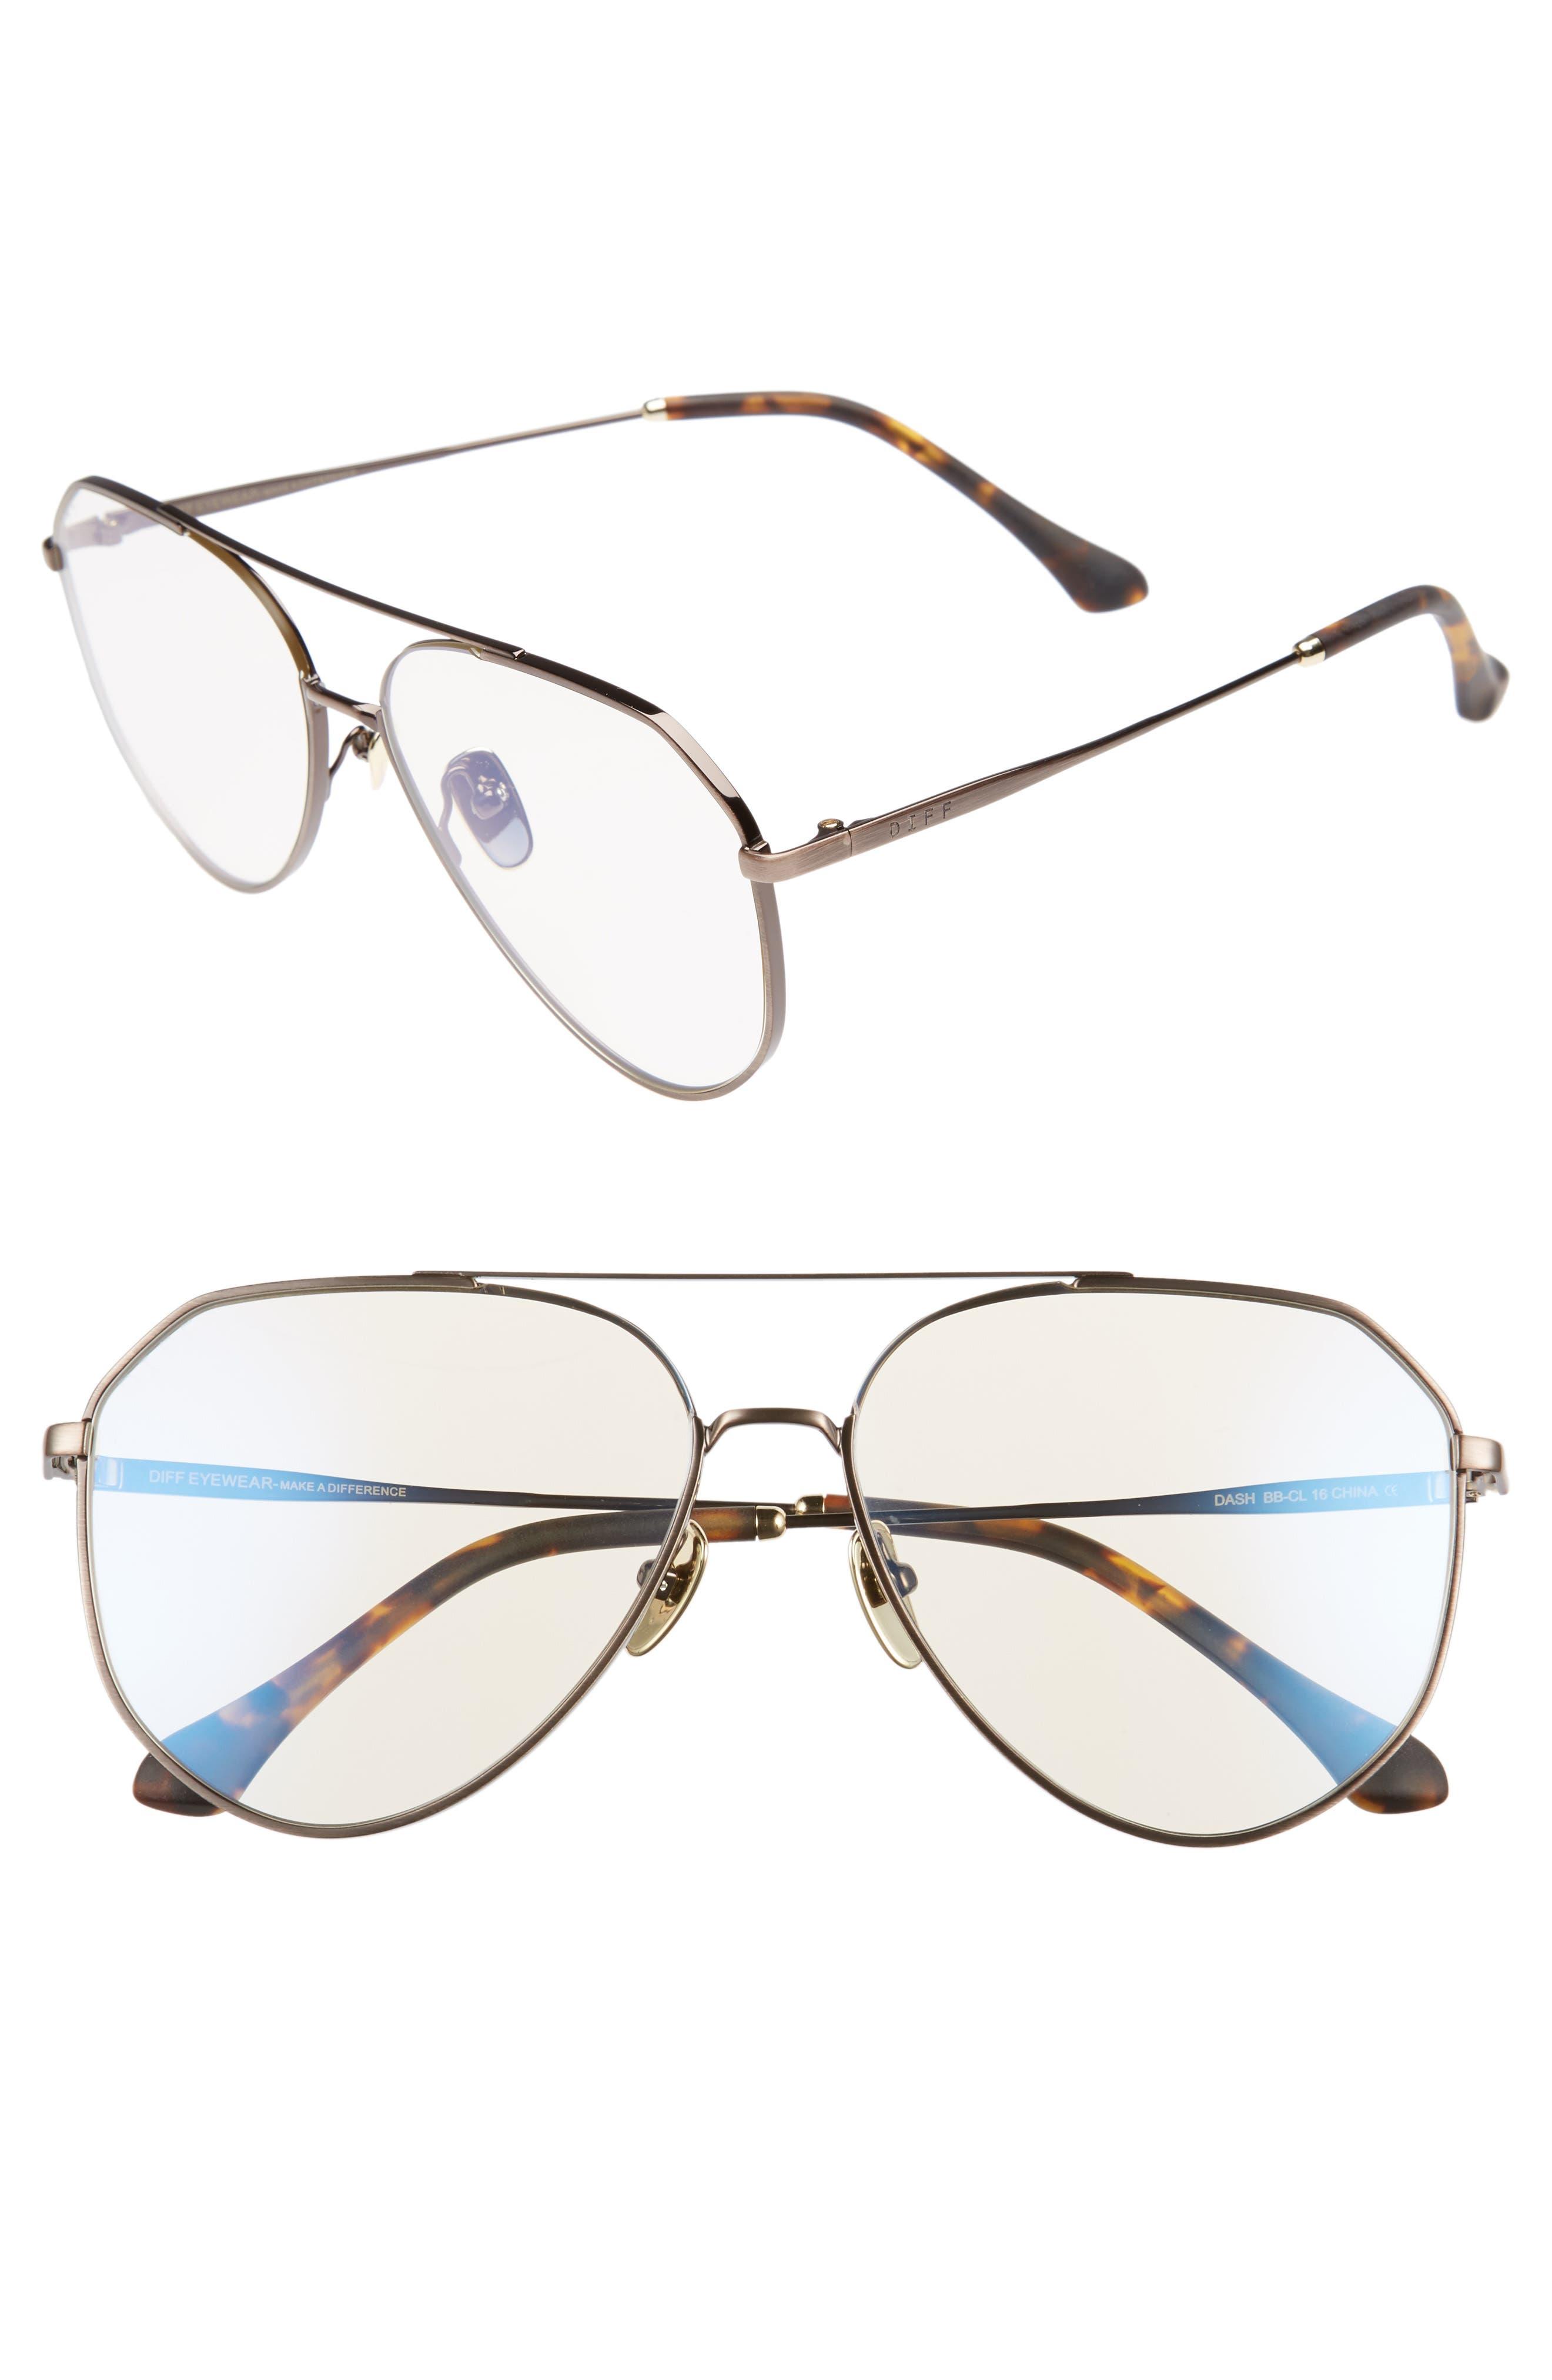 Dash 61mm Aviator Sunglasses,                             Main thumbnail 1, color,                             200